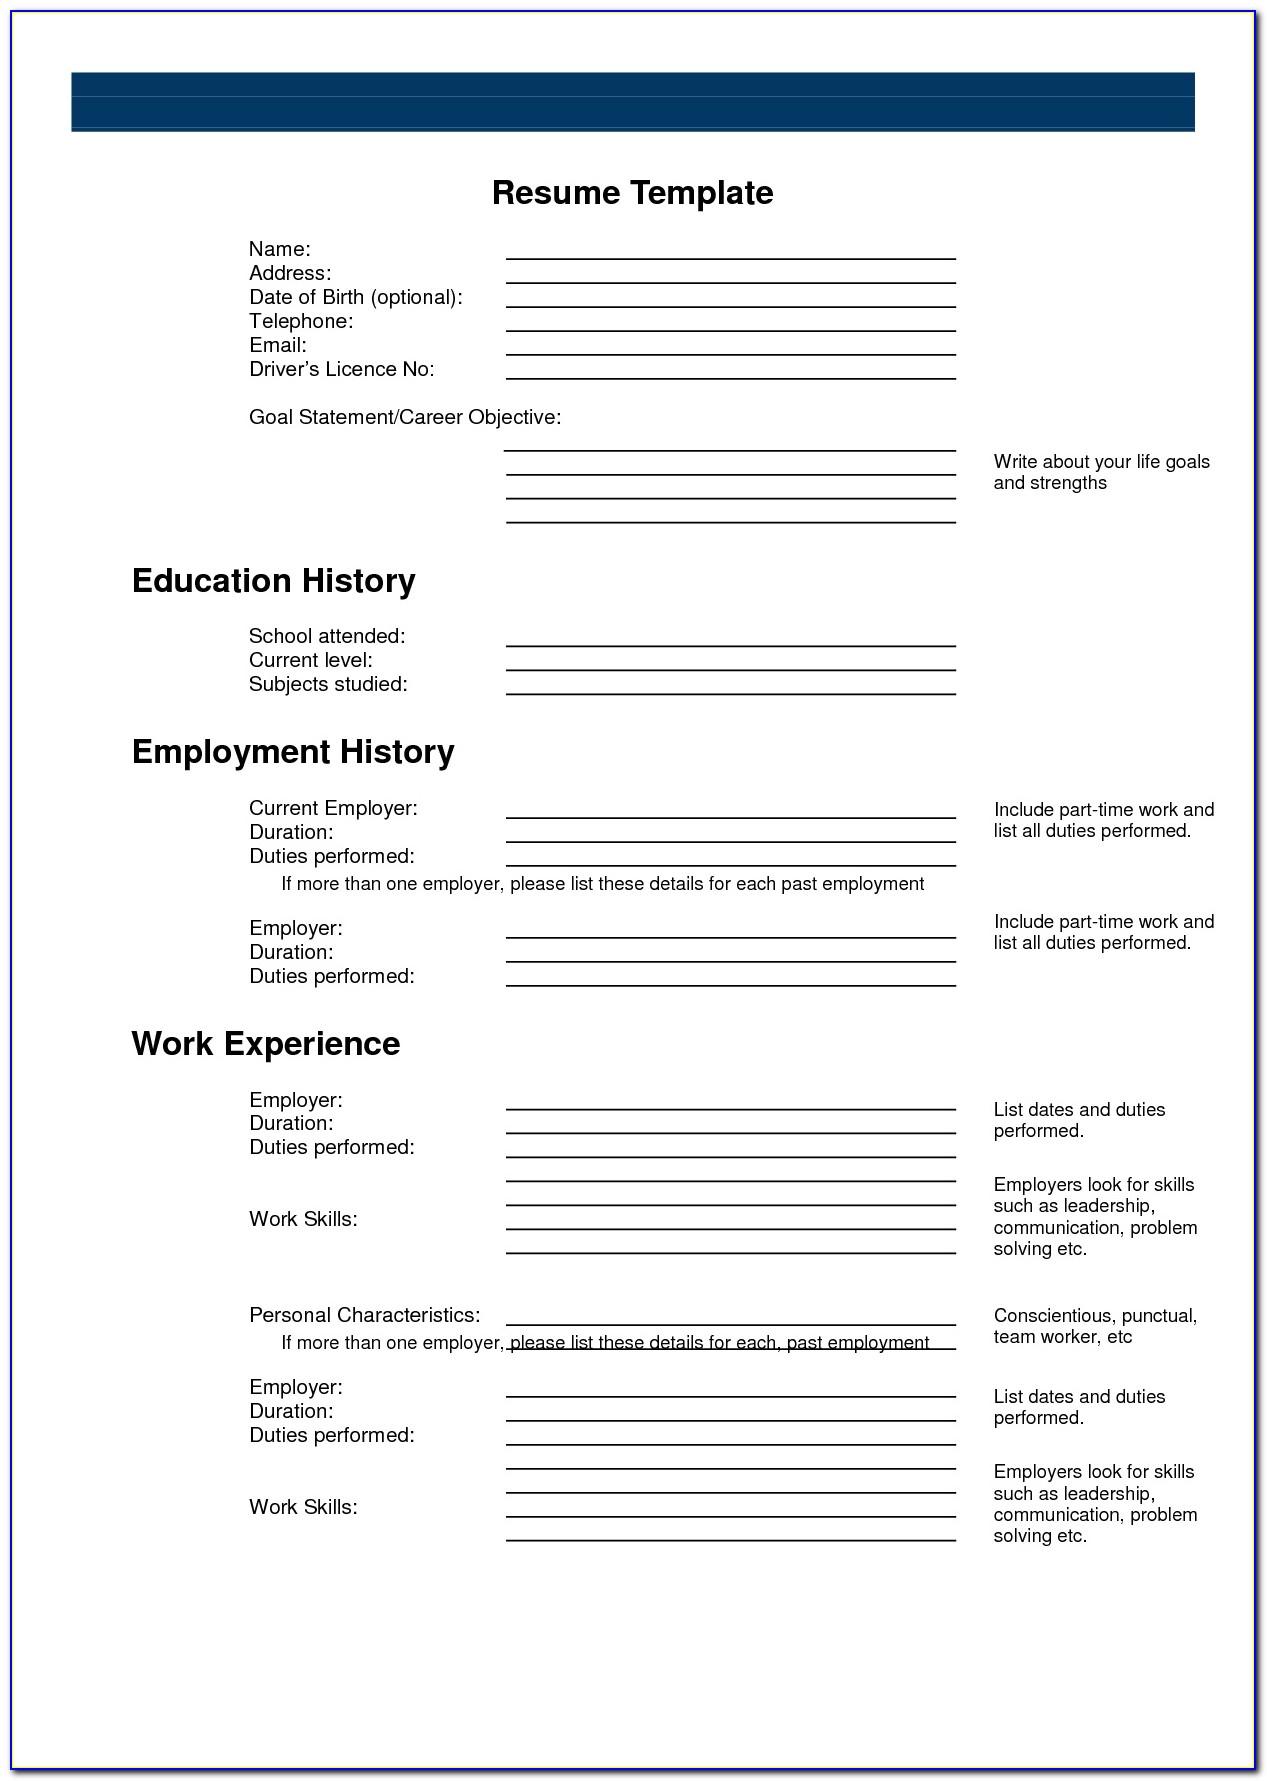 Resume Writing Template Printable